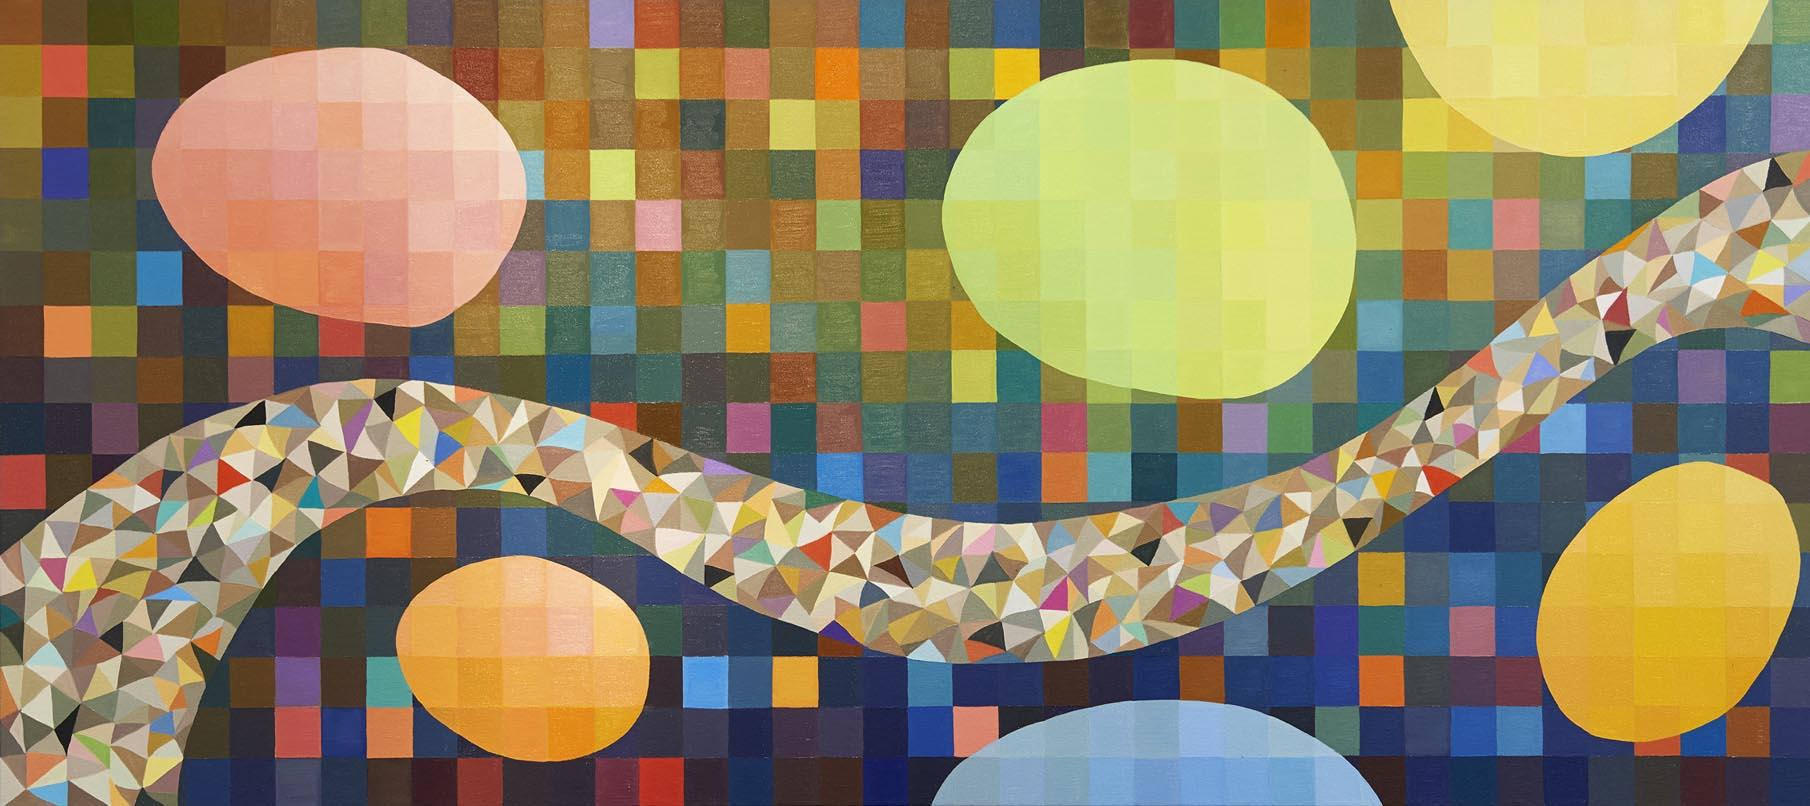 Kari-Bienert-Colour-Babies-Garden-for-the-Children-Oil-on-canvas-200X93cm